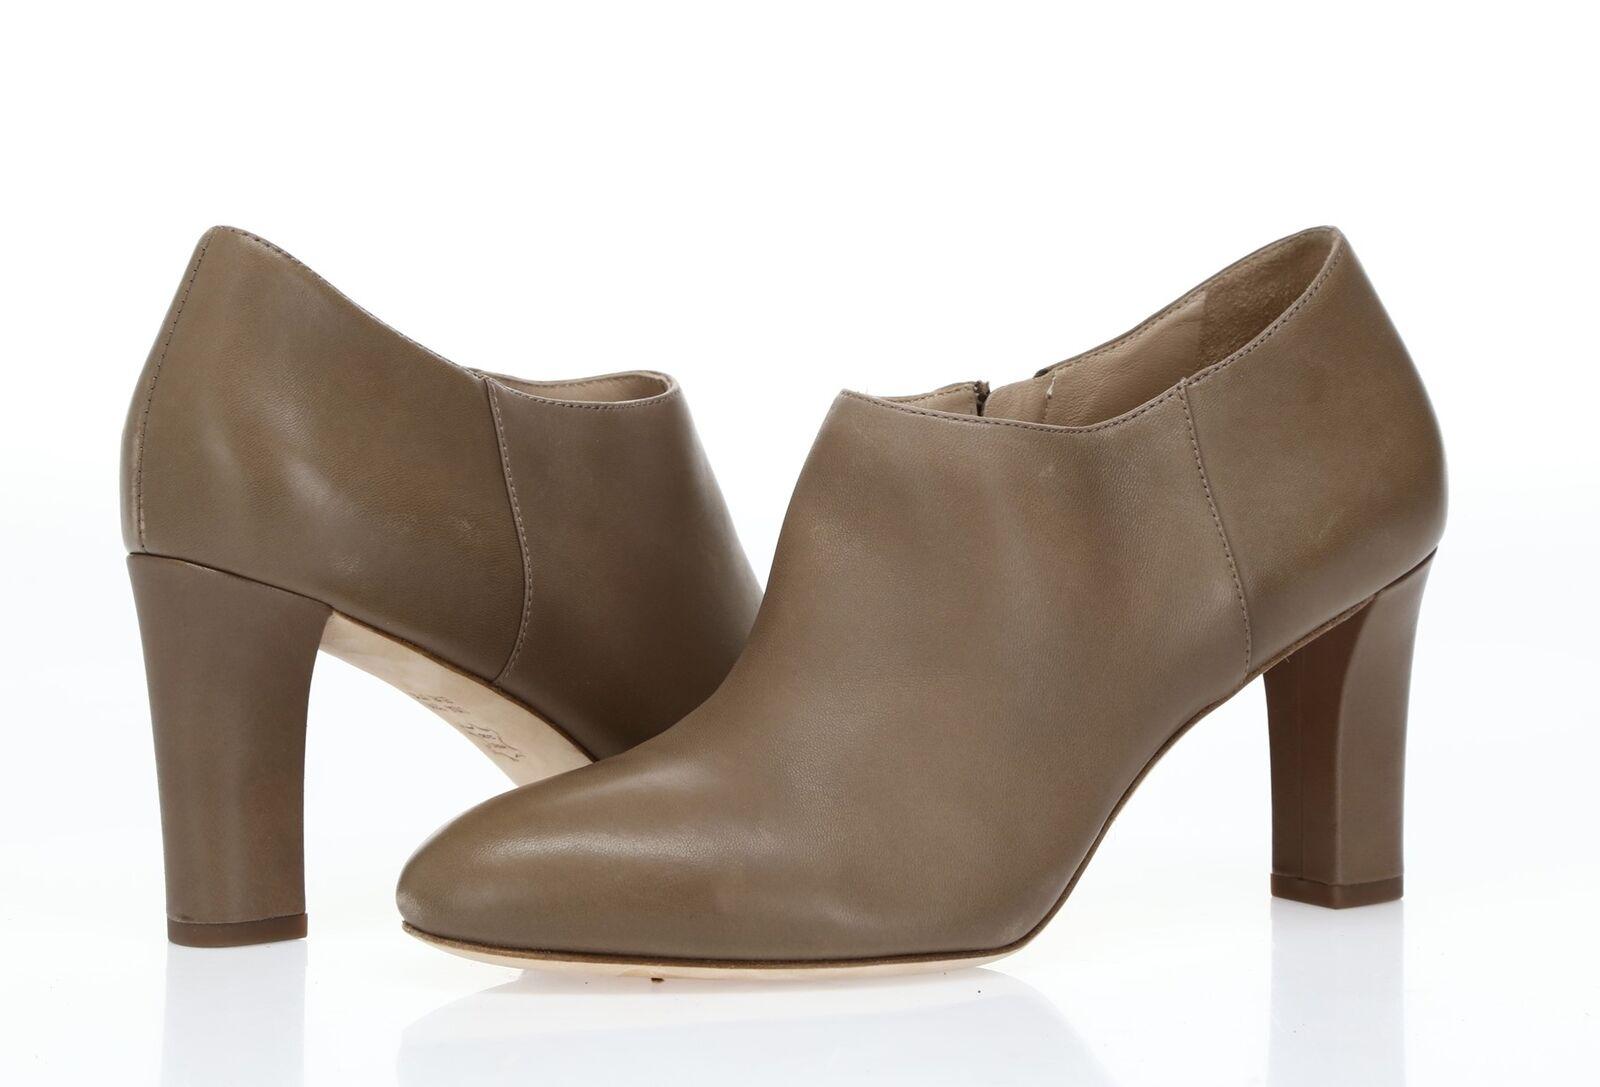 Via Spiga Cuero gris Pardo Mujer Tobillo Cremallera Cremallera Cremallera Botines Talla 7.5 M (37.5)  moda clasica